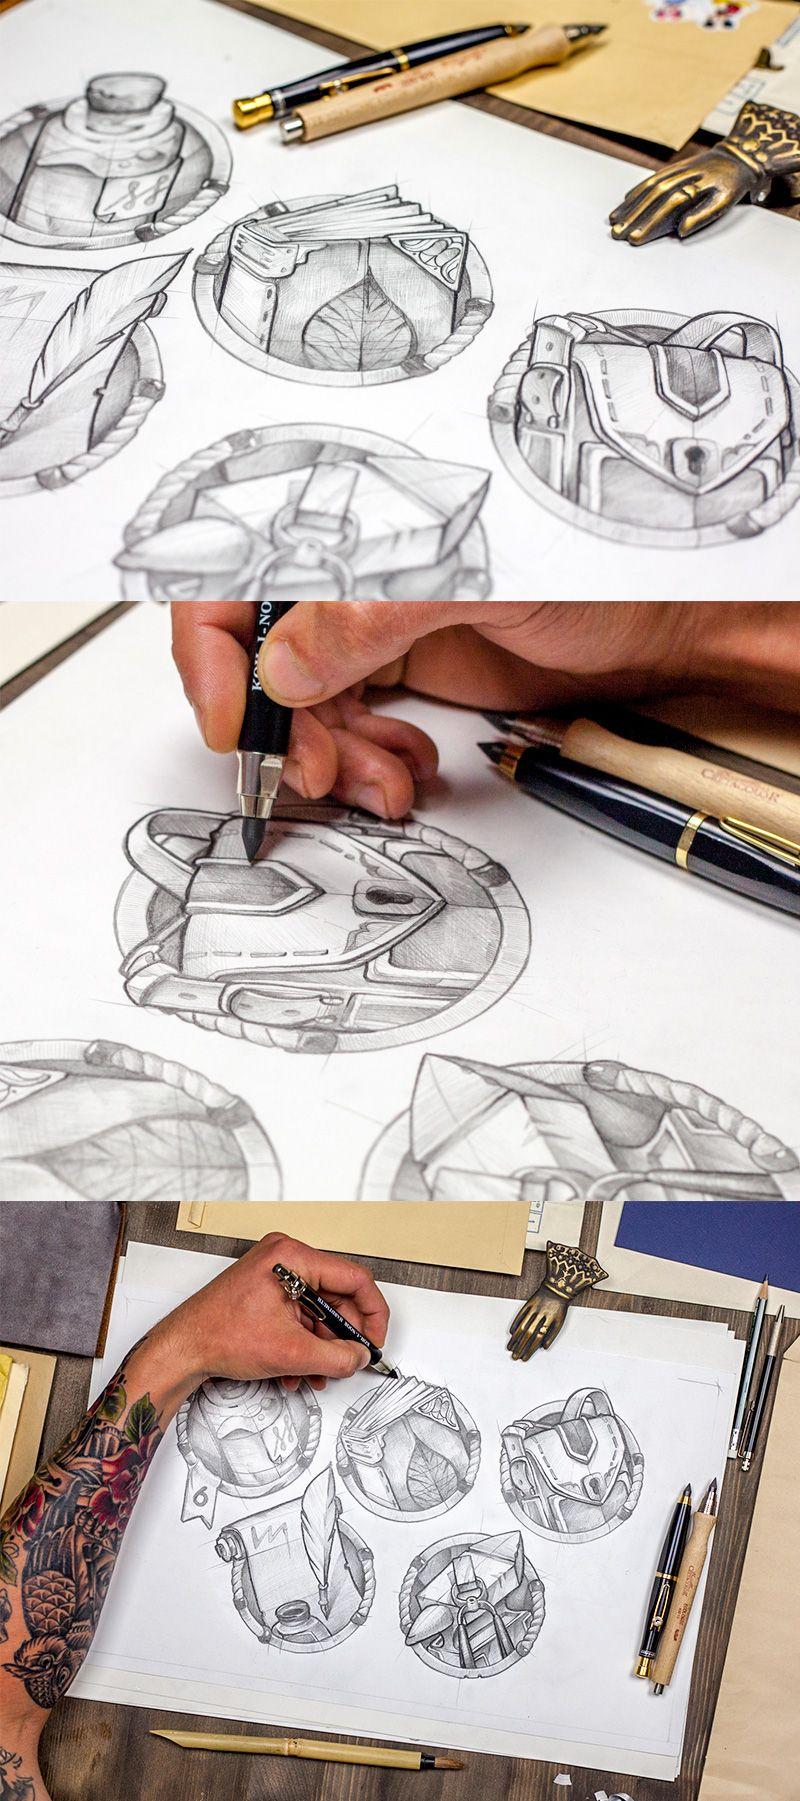 Drawings Attach Manos Dibujo Disenos De Dibujo Dibujos A Lapiz